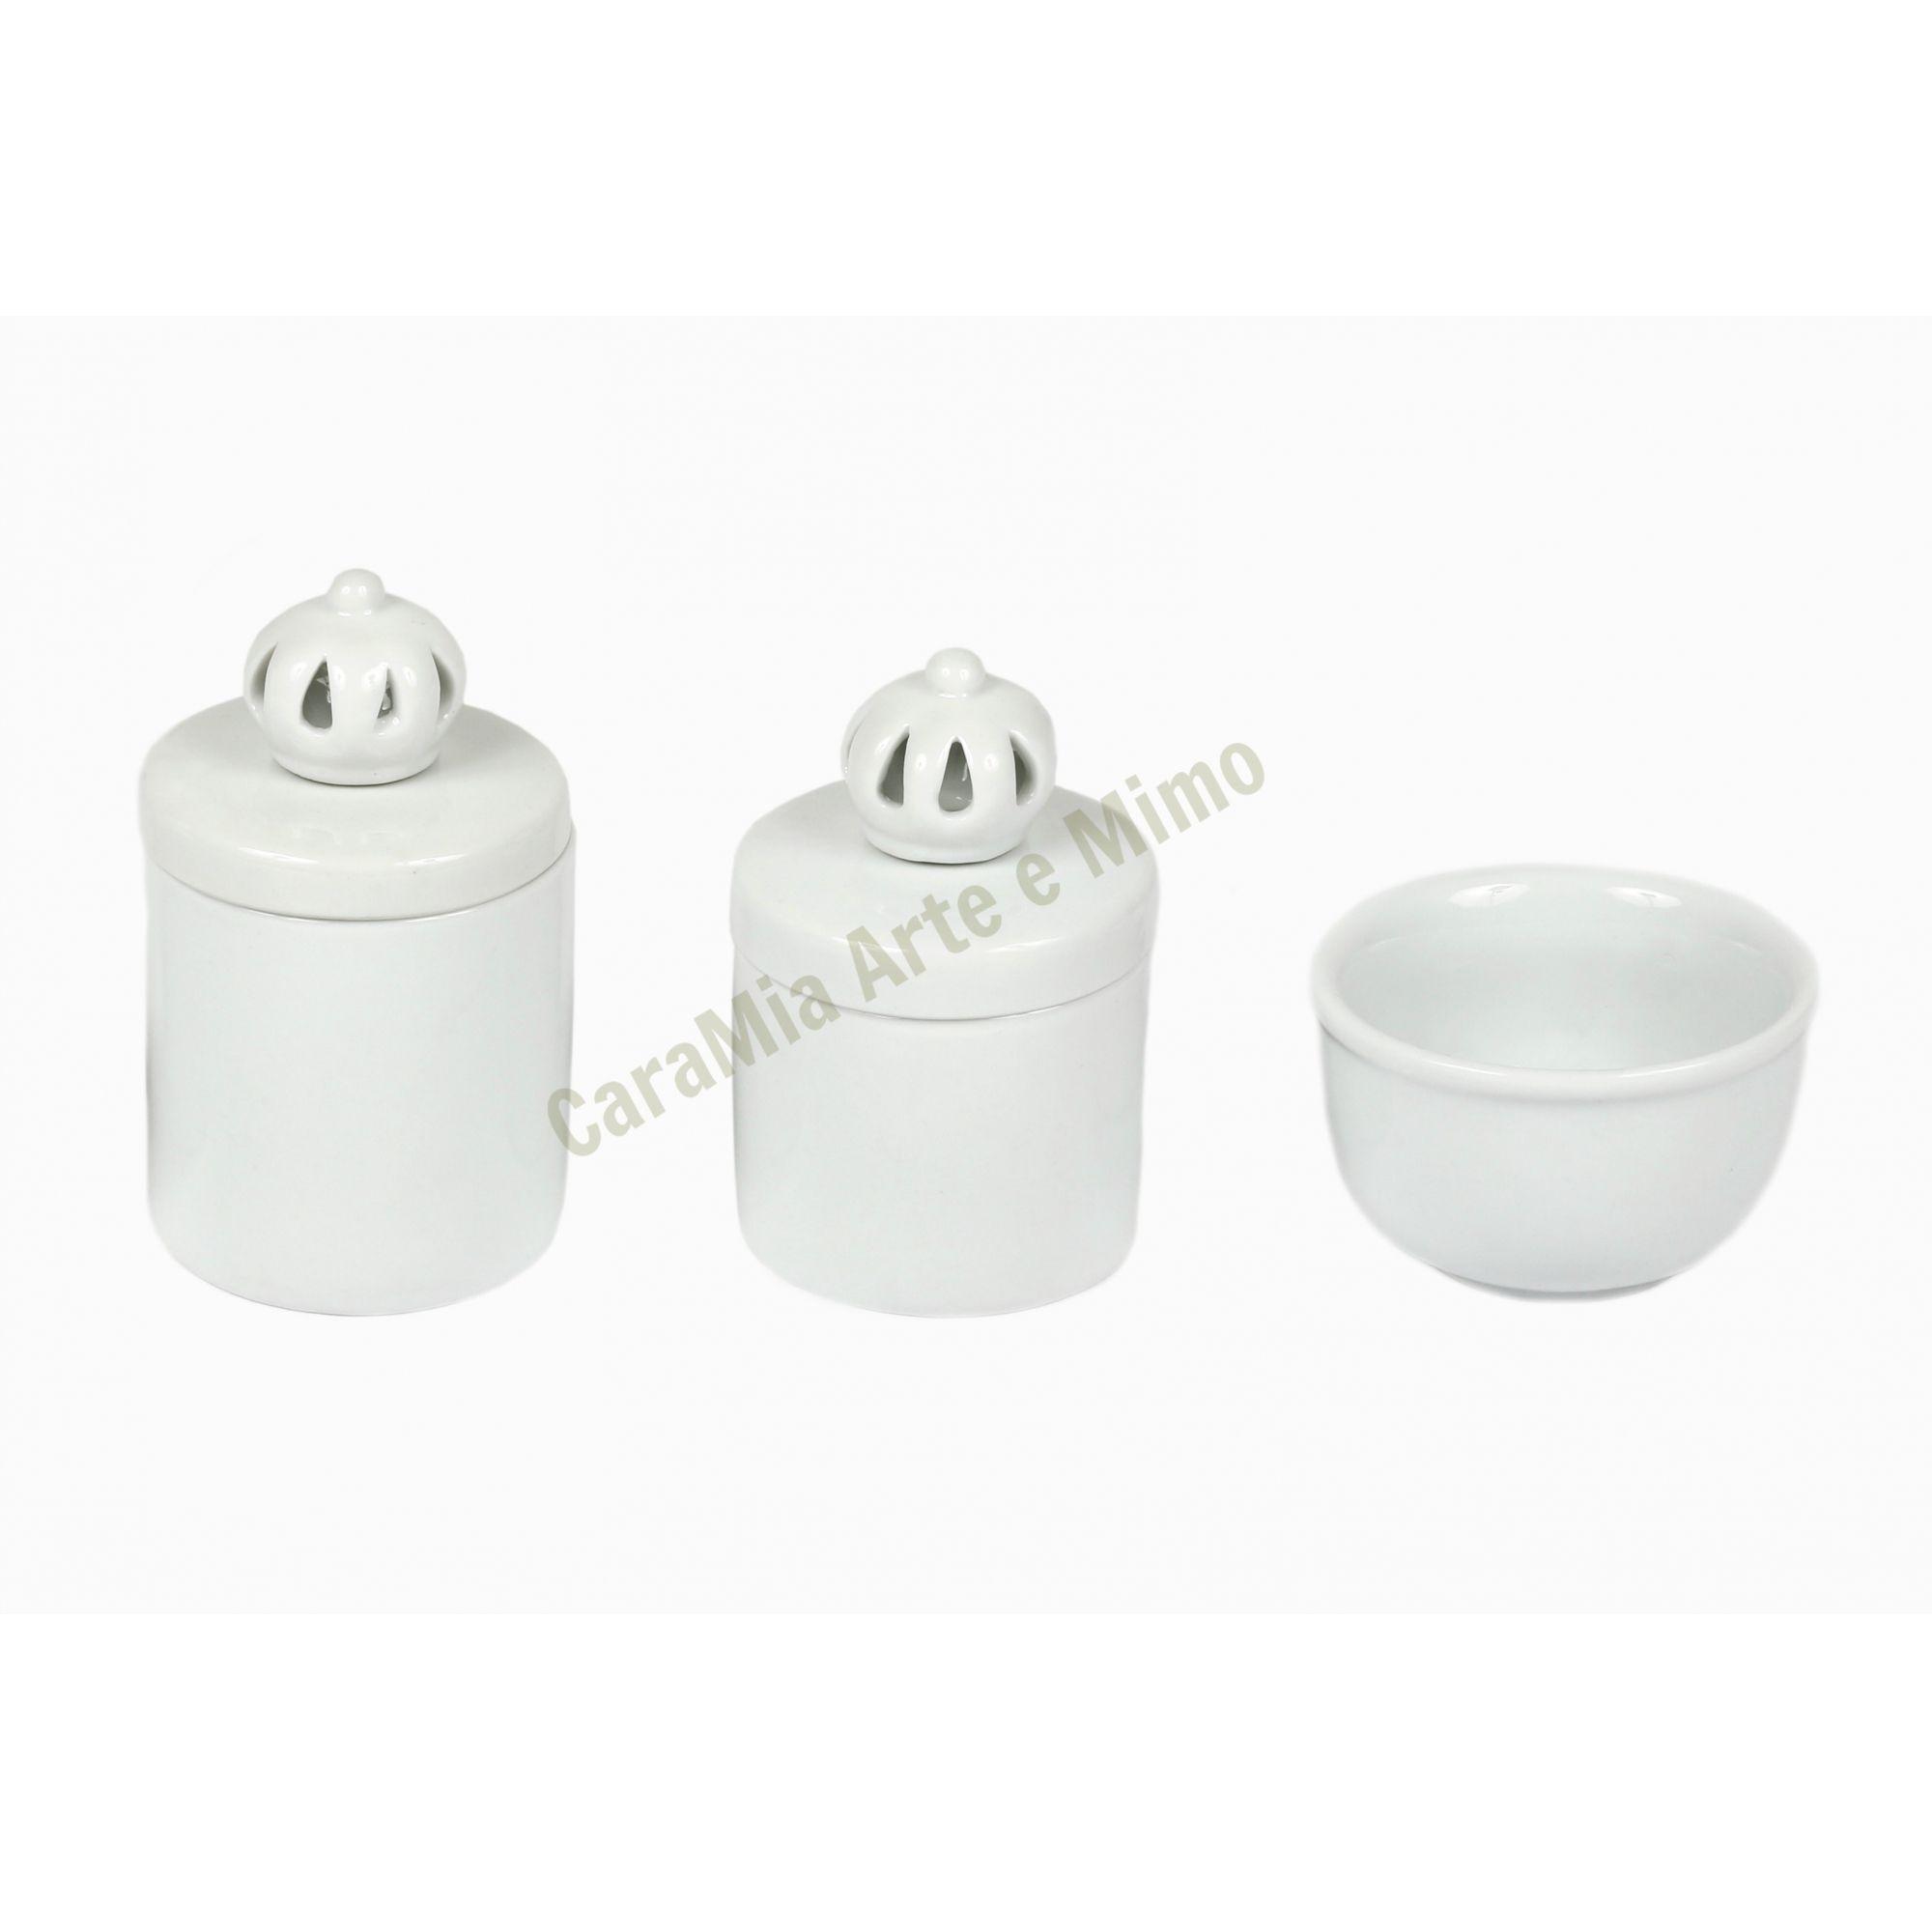 Kit Higiene Bebê Porcelana | Coroa Branca | 3 Peças |